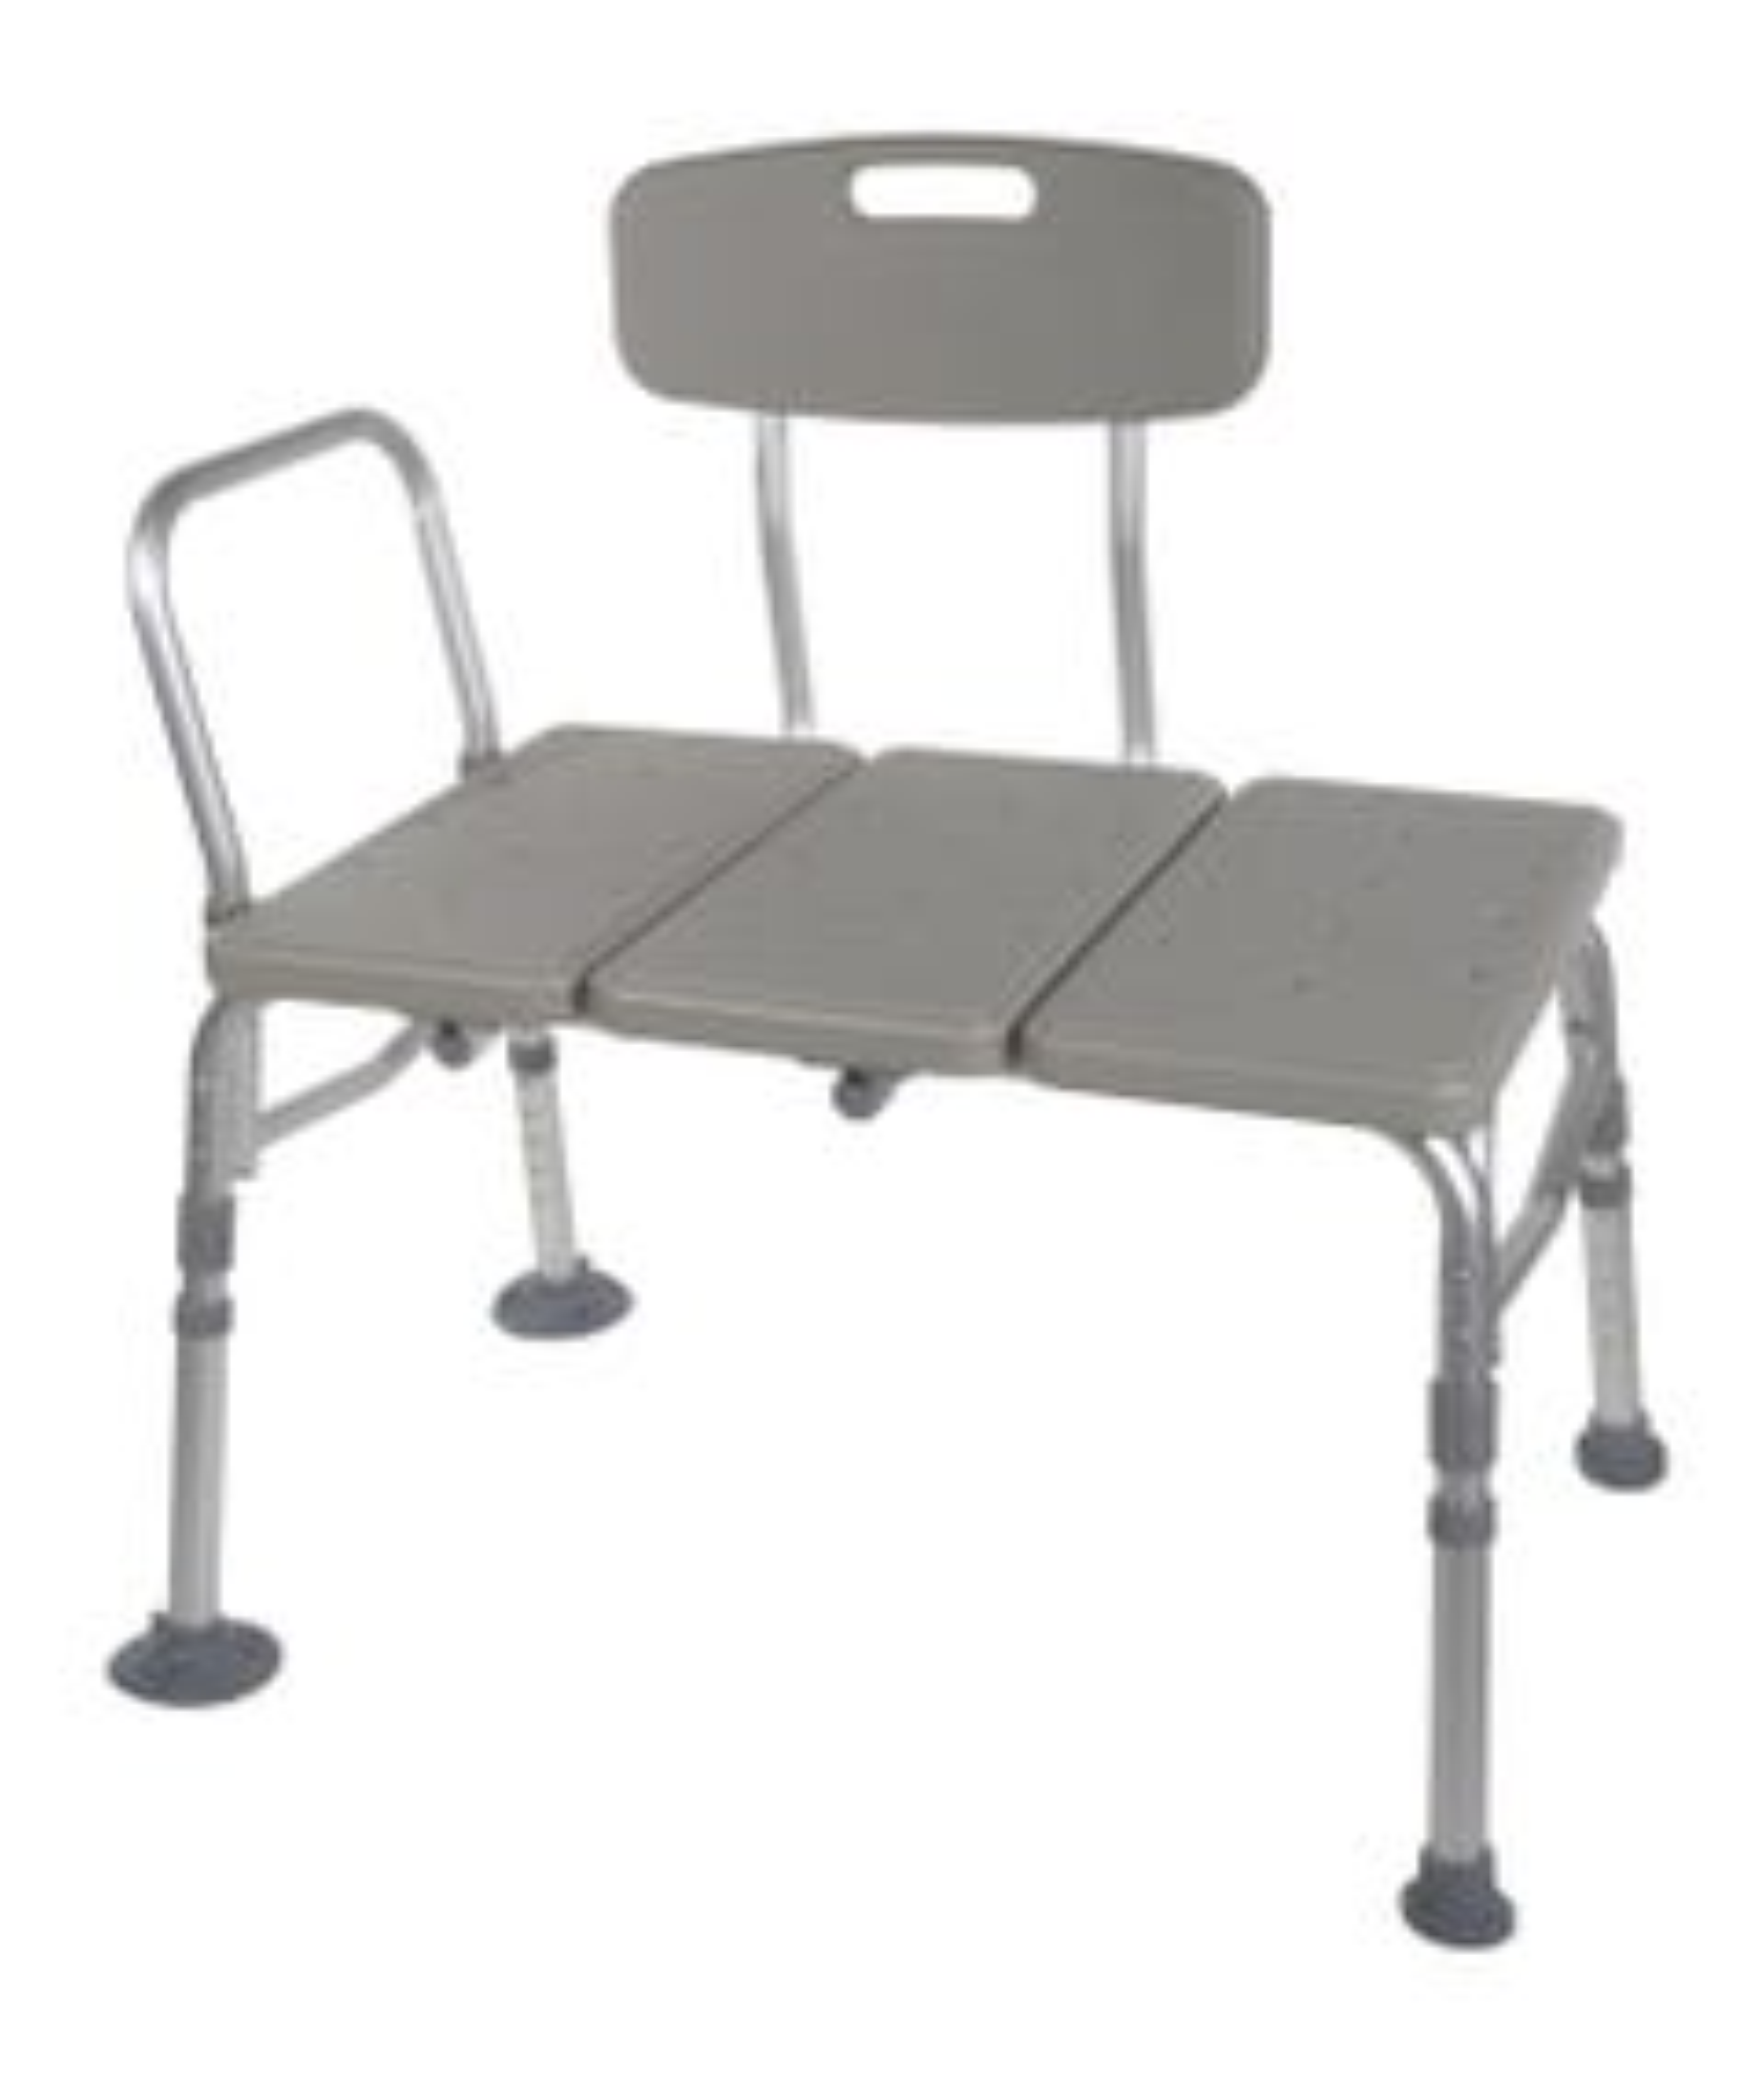 Drive 12011kd-1 Plastic Transfer Bench with Adjustable Backrest